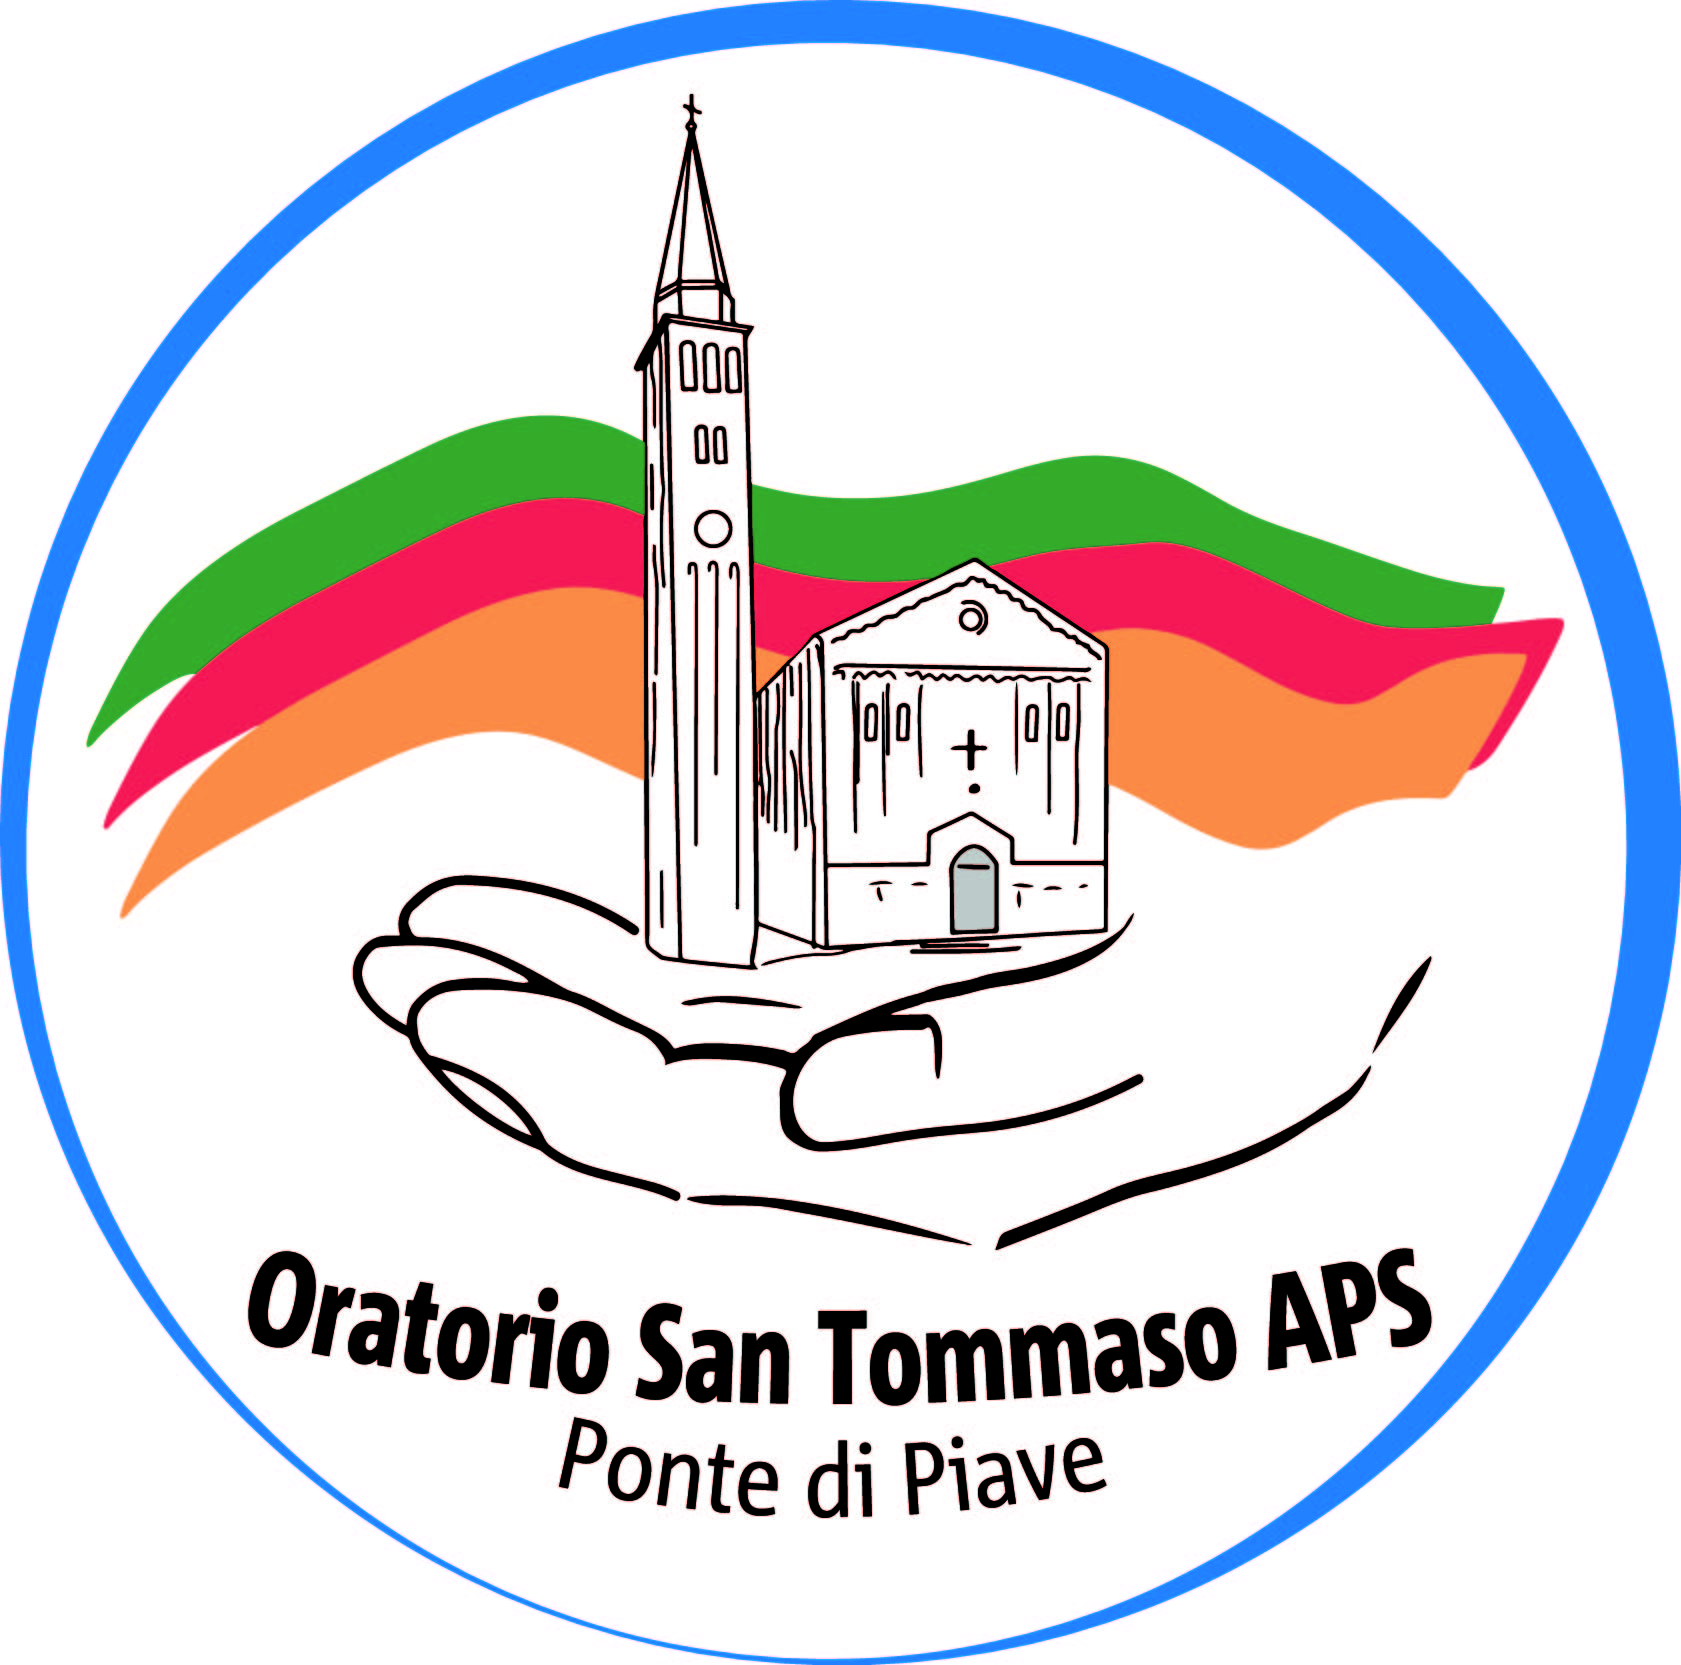 Oratorio San Tommaso APS